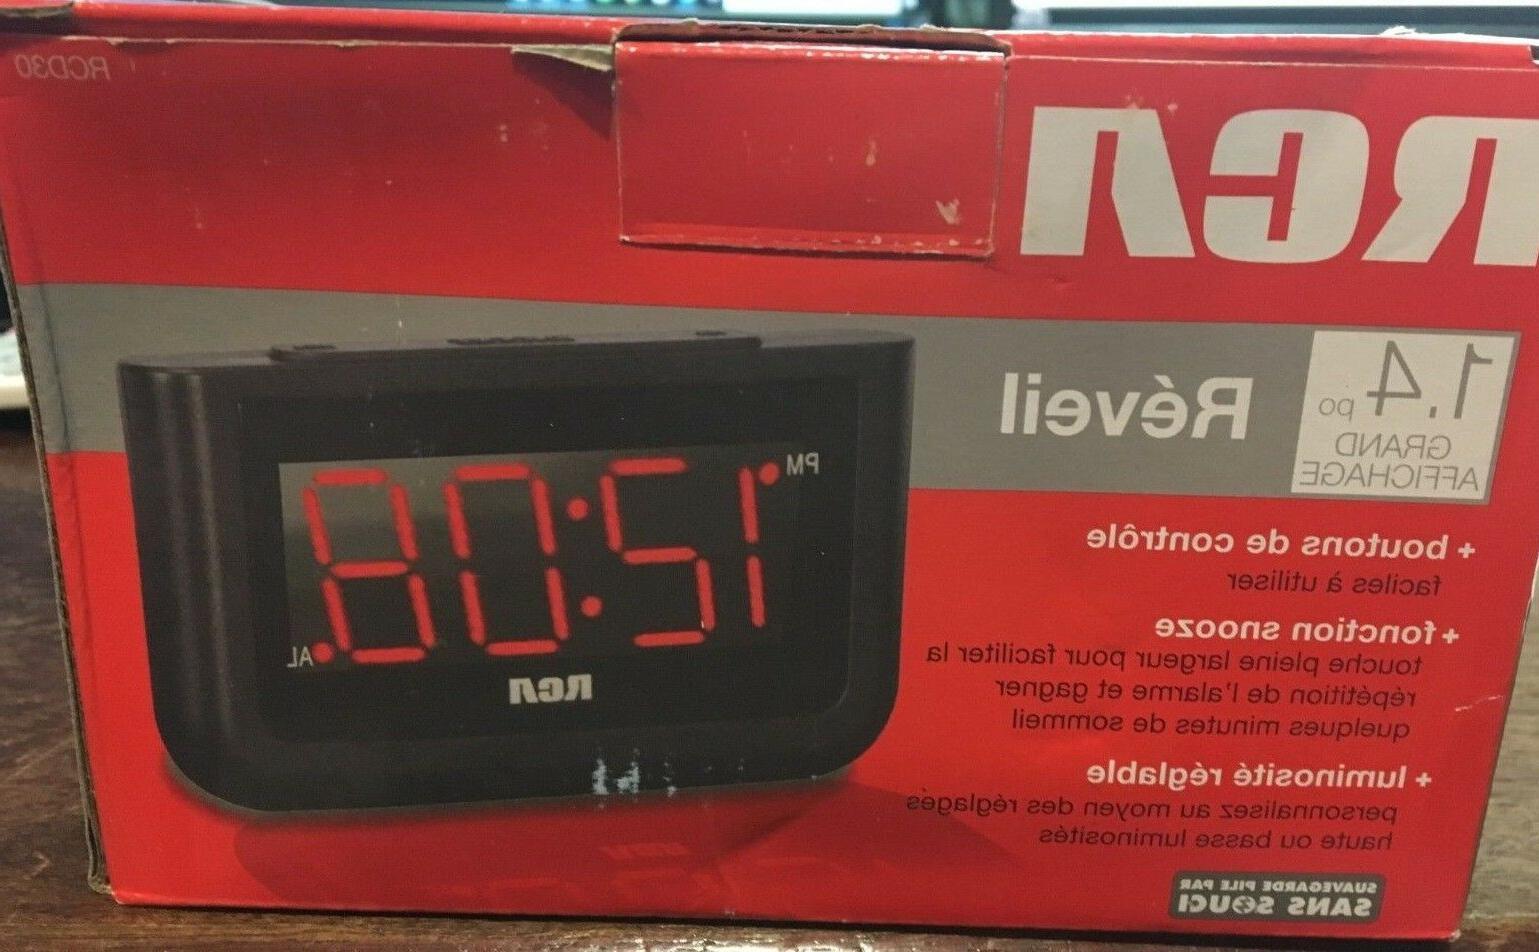 RCA Digital Alarm Clock with New